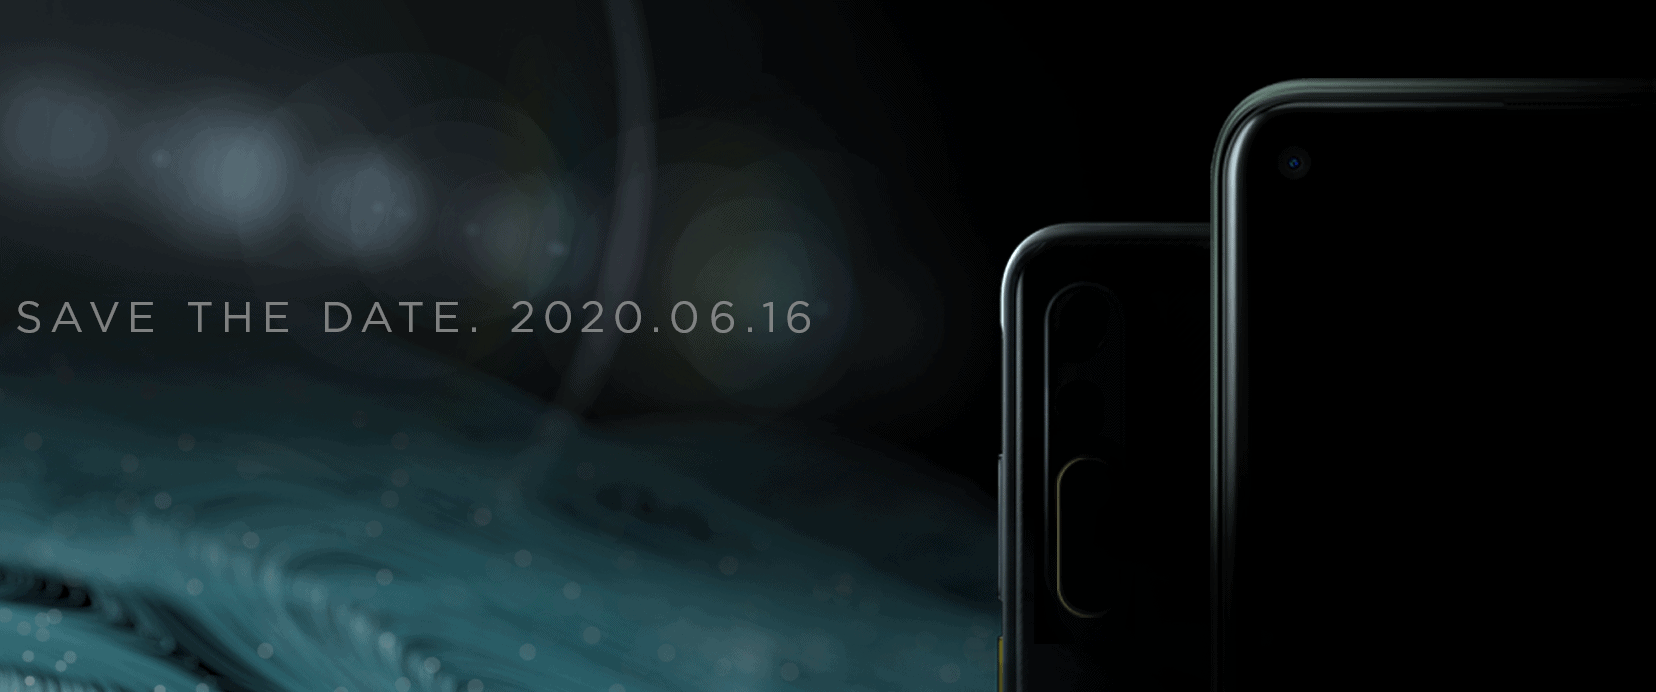 htc desire 20 pro launch